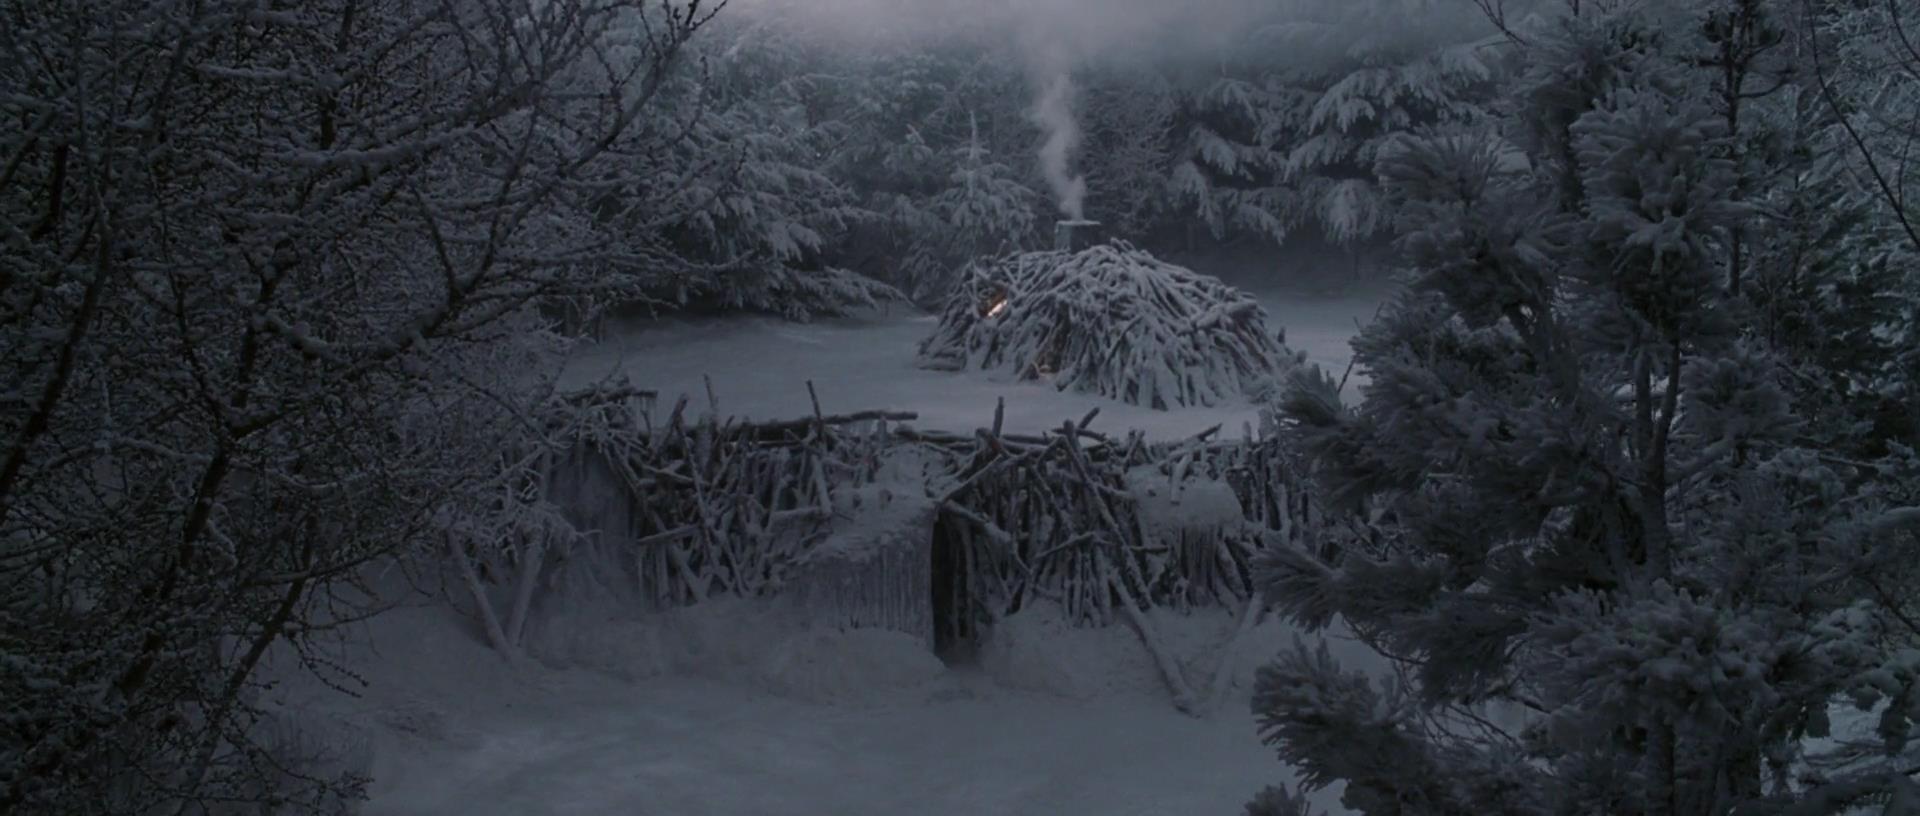 Beaver's Dam | The Chronicles of Narnia Wiki | Fandom